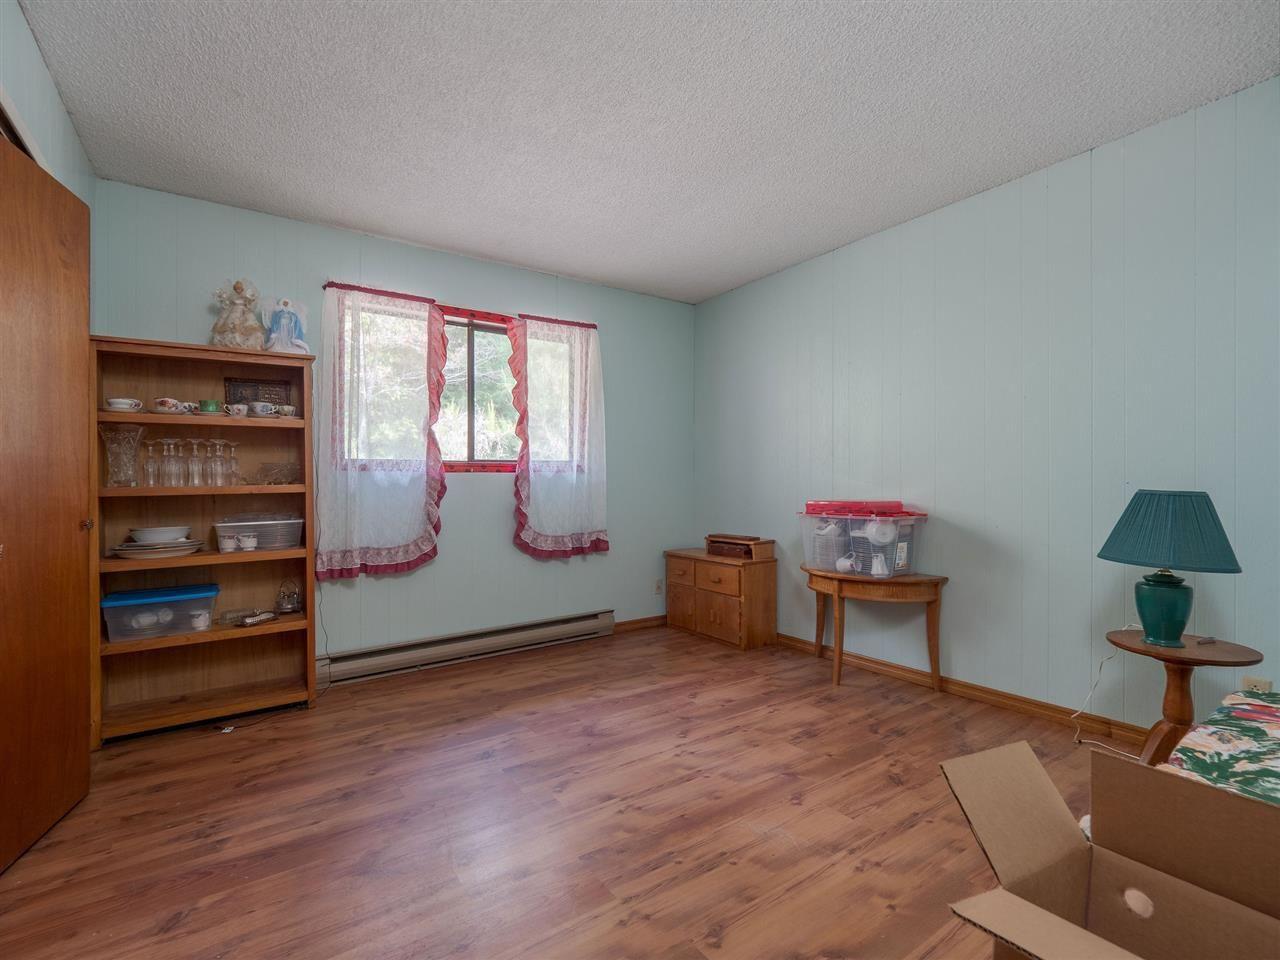 Photo 13: Photos: 6820 NORWEST BAY Road in Sechelt: Sechelt District House for sale (Sunshine Coast)  : MLS®# R2553107